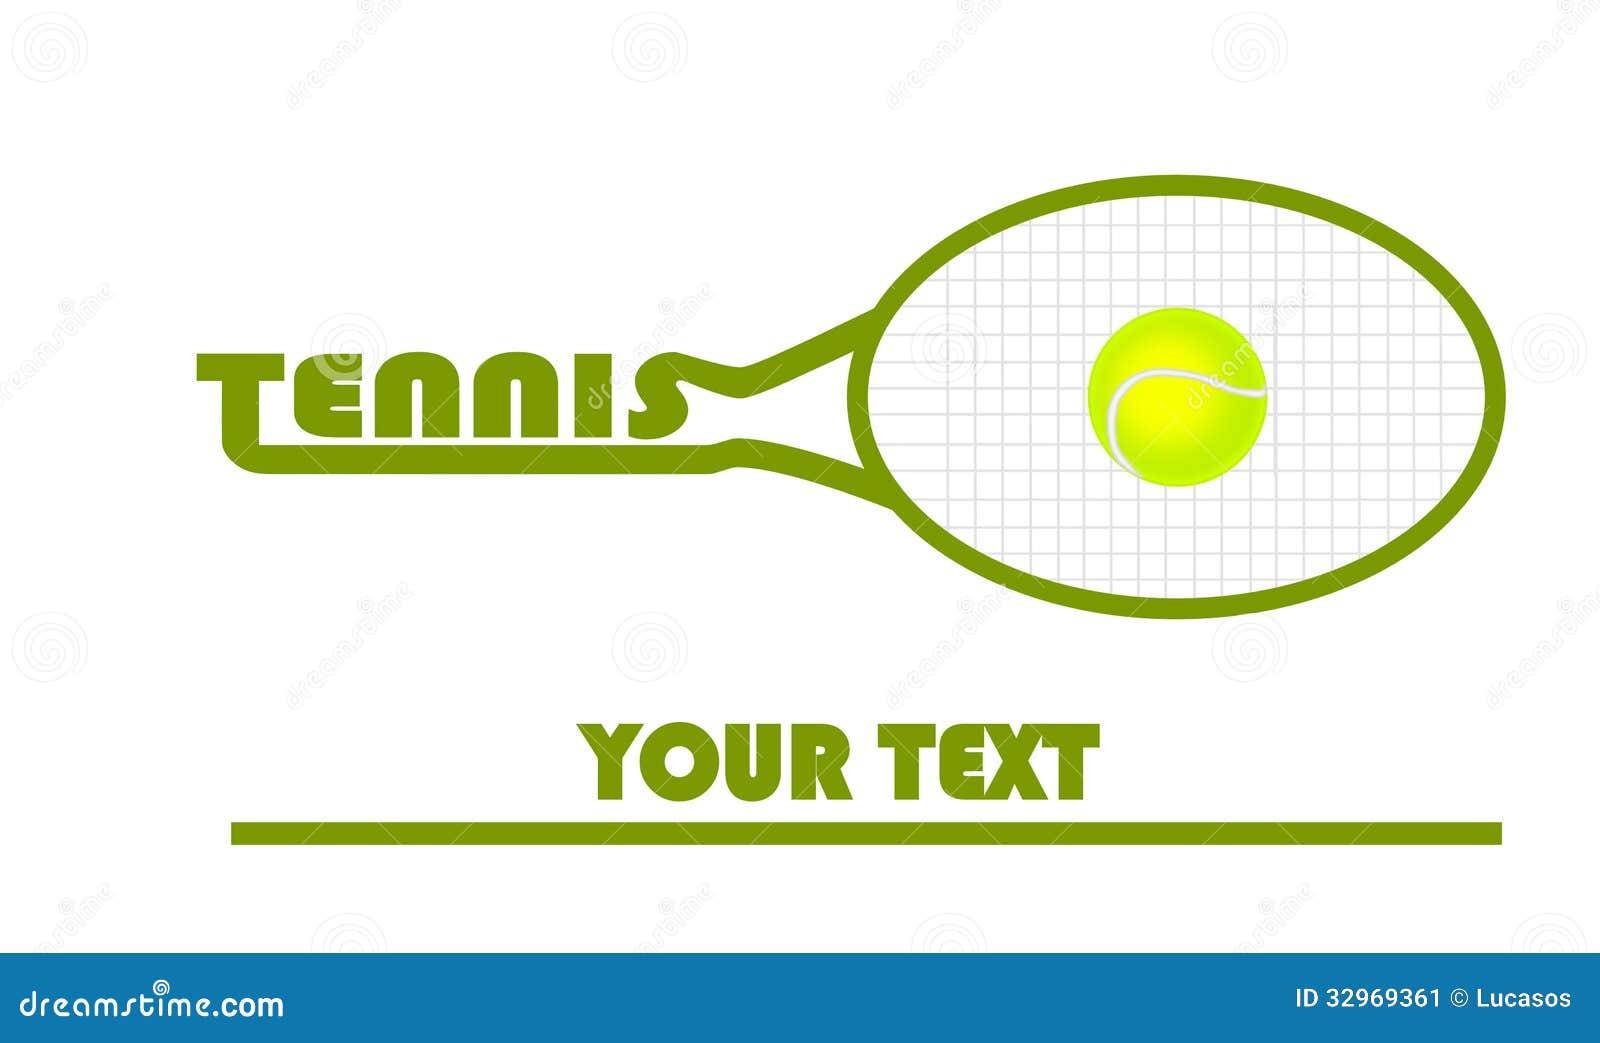 Tennis Logo With Tennis Ball Stock Image - Image: 32969361